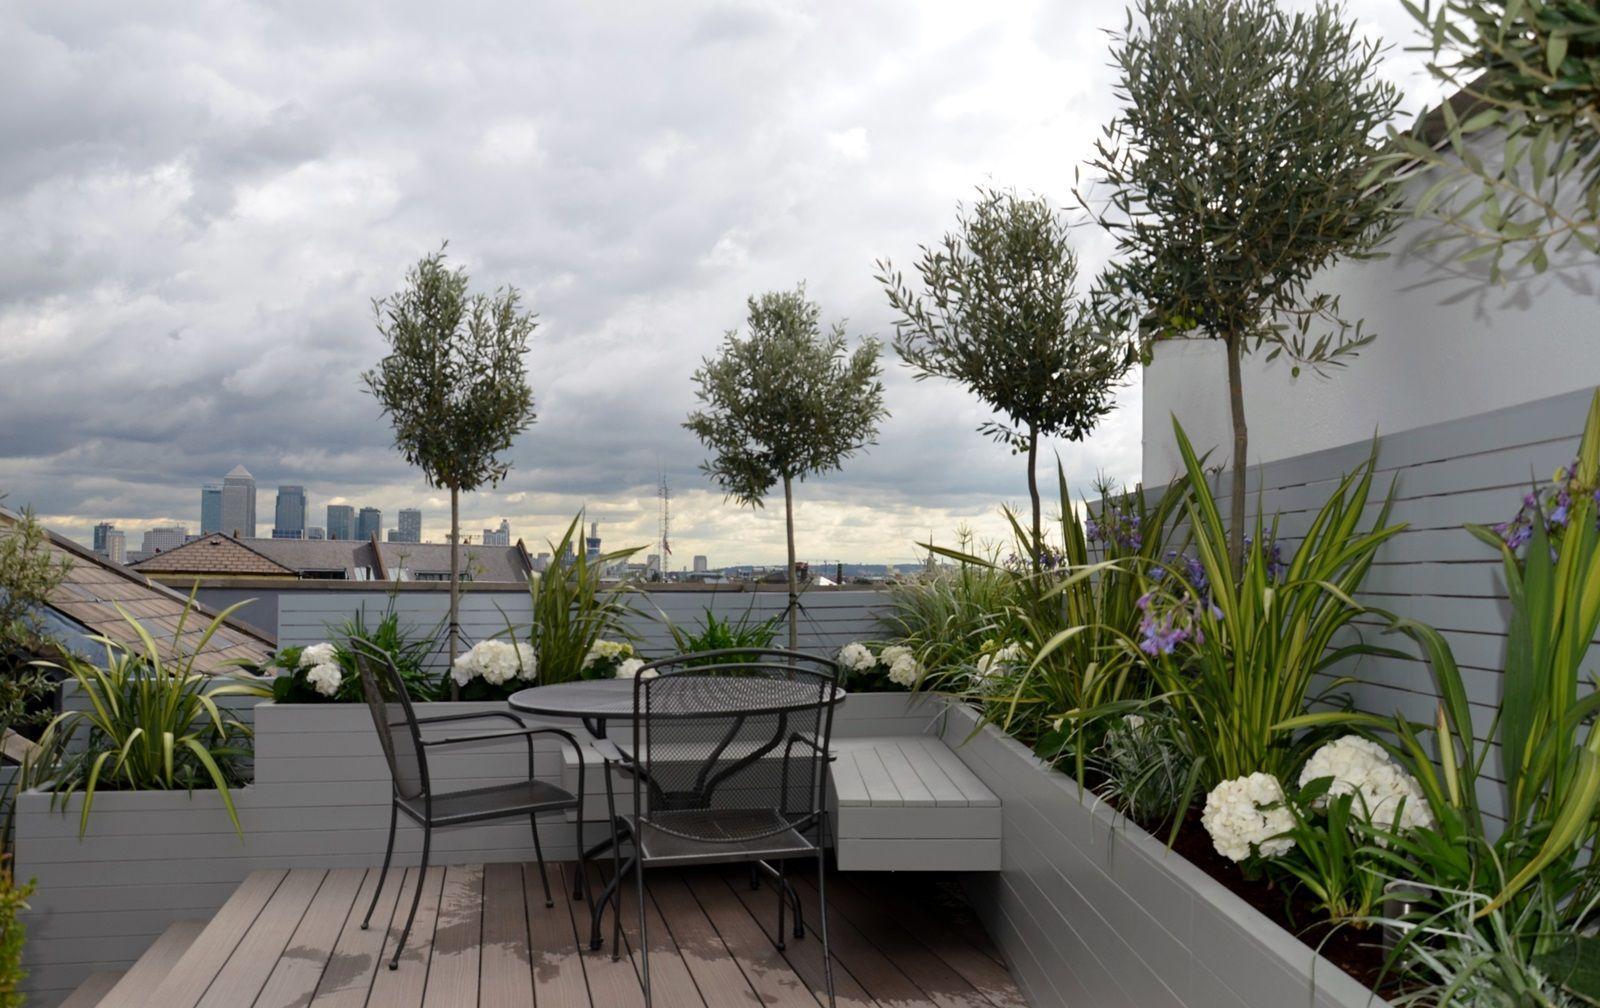 Modern Roof Terrace Garden Design Tower Bridge Docklands London High Chinese Bridge Chinese D In 2020 Terrace Garden Design Modern Garden Design Garden Design